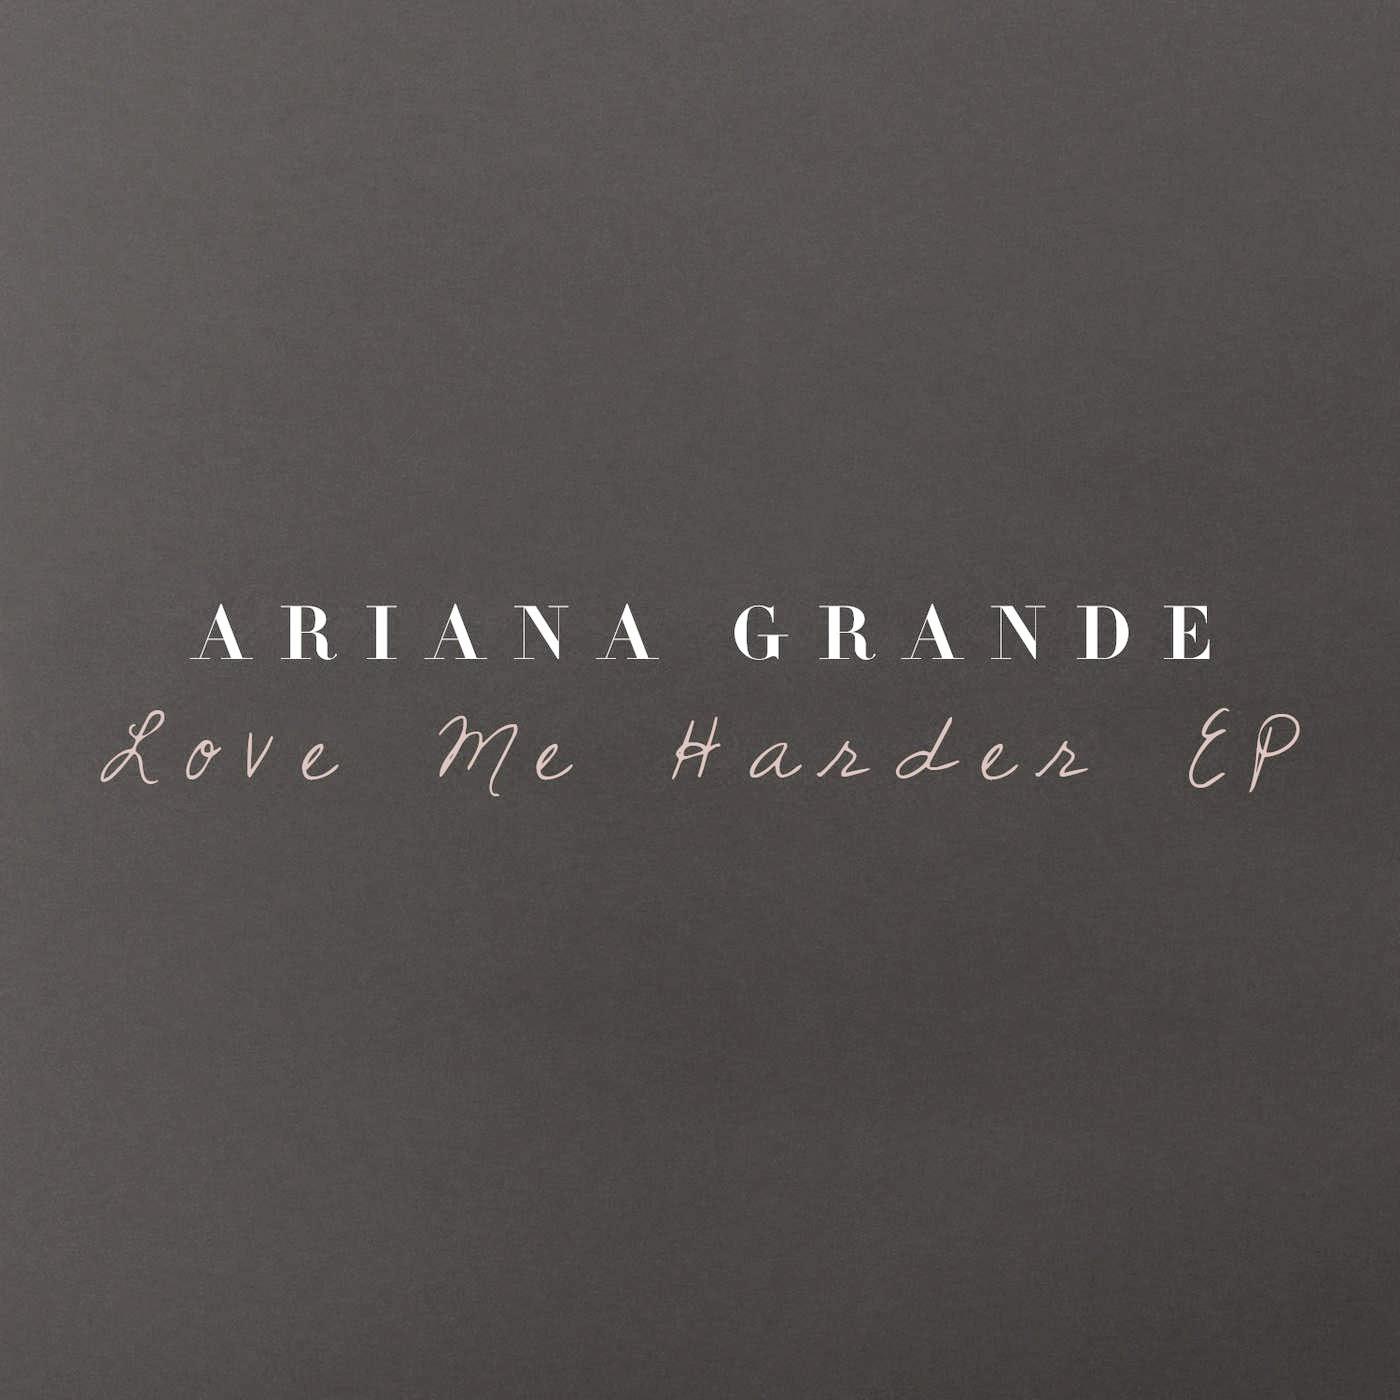 Ariana Grande - Love Me Harder - Single Cover